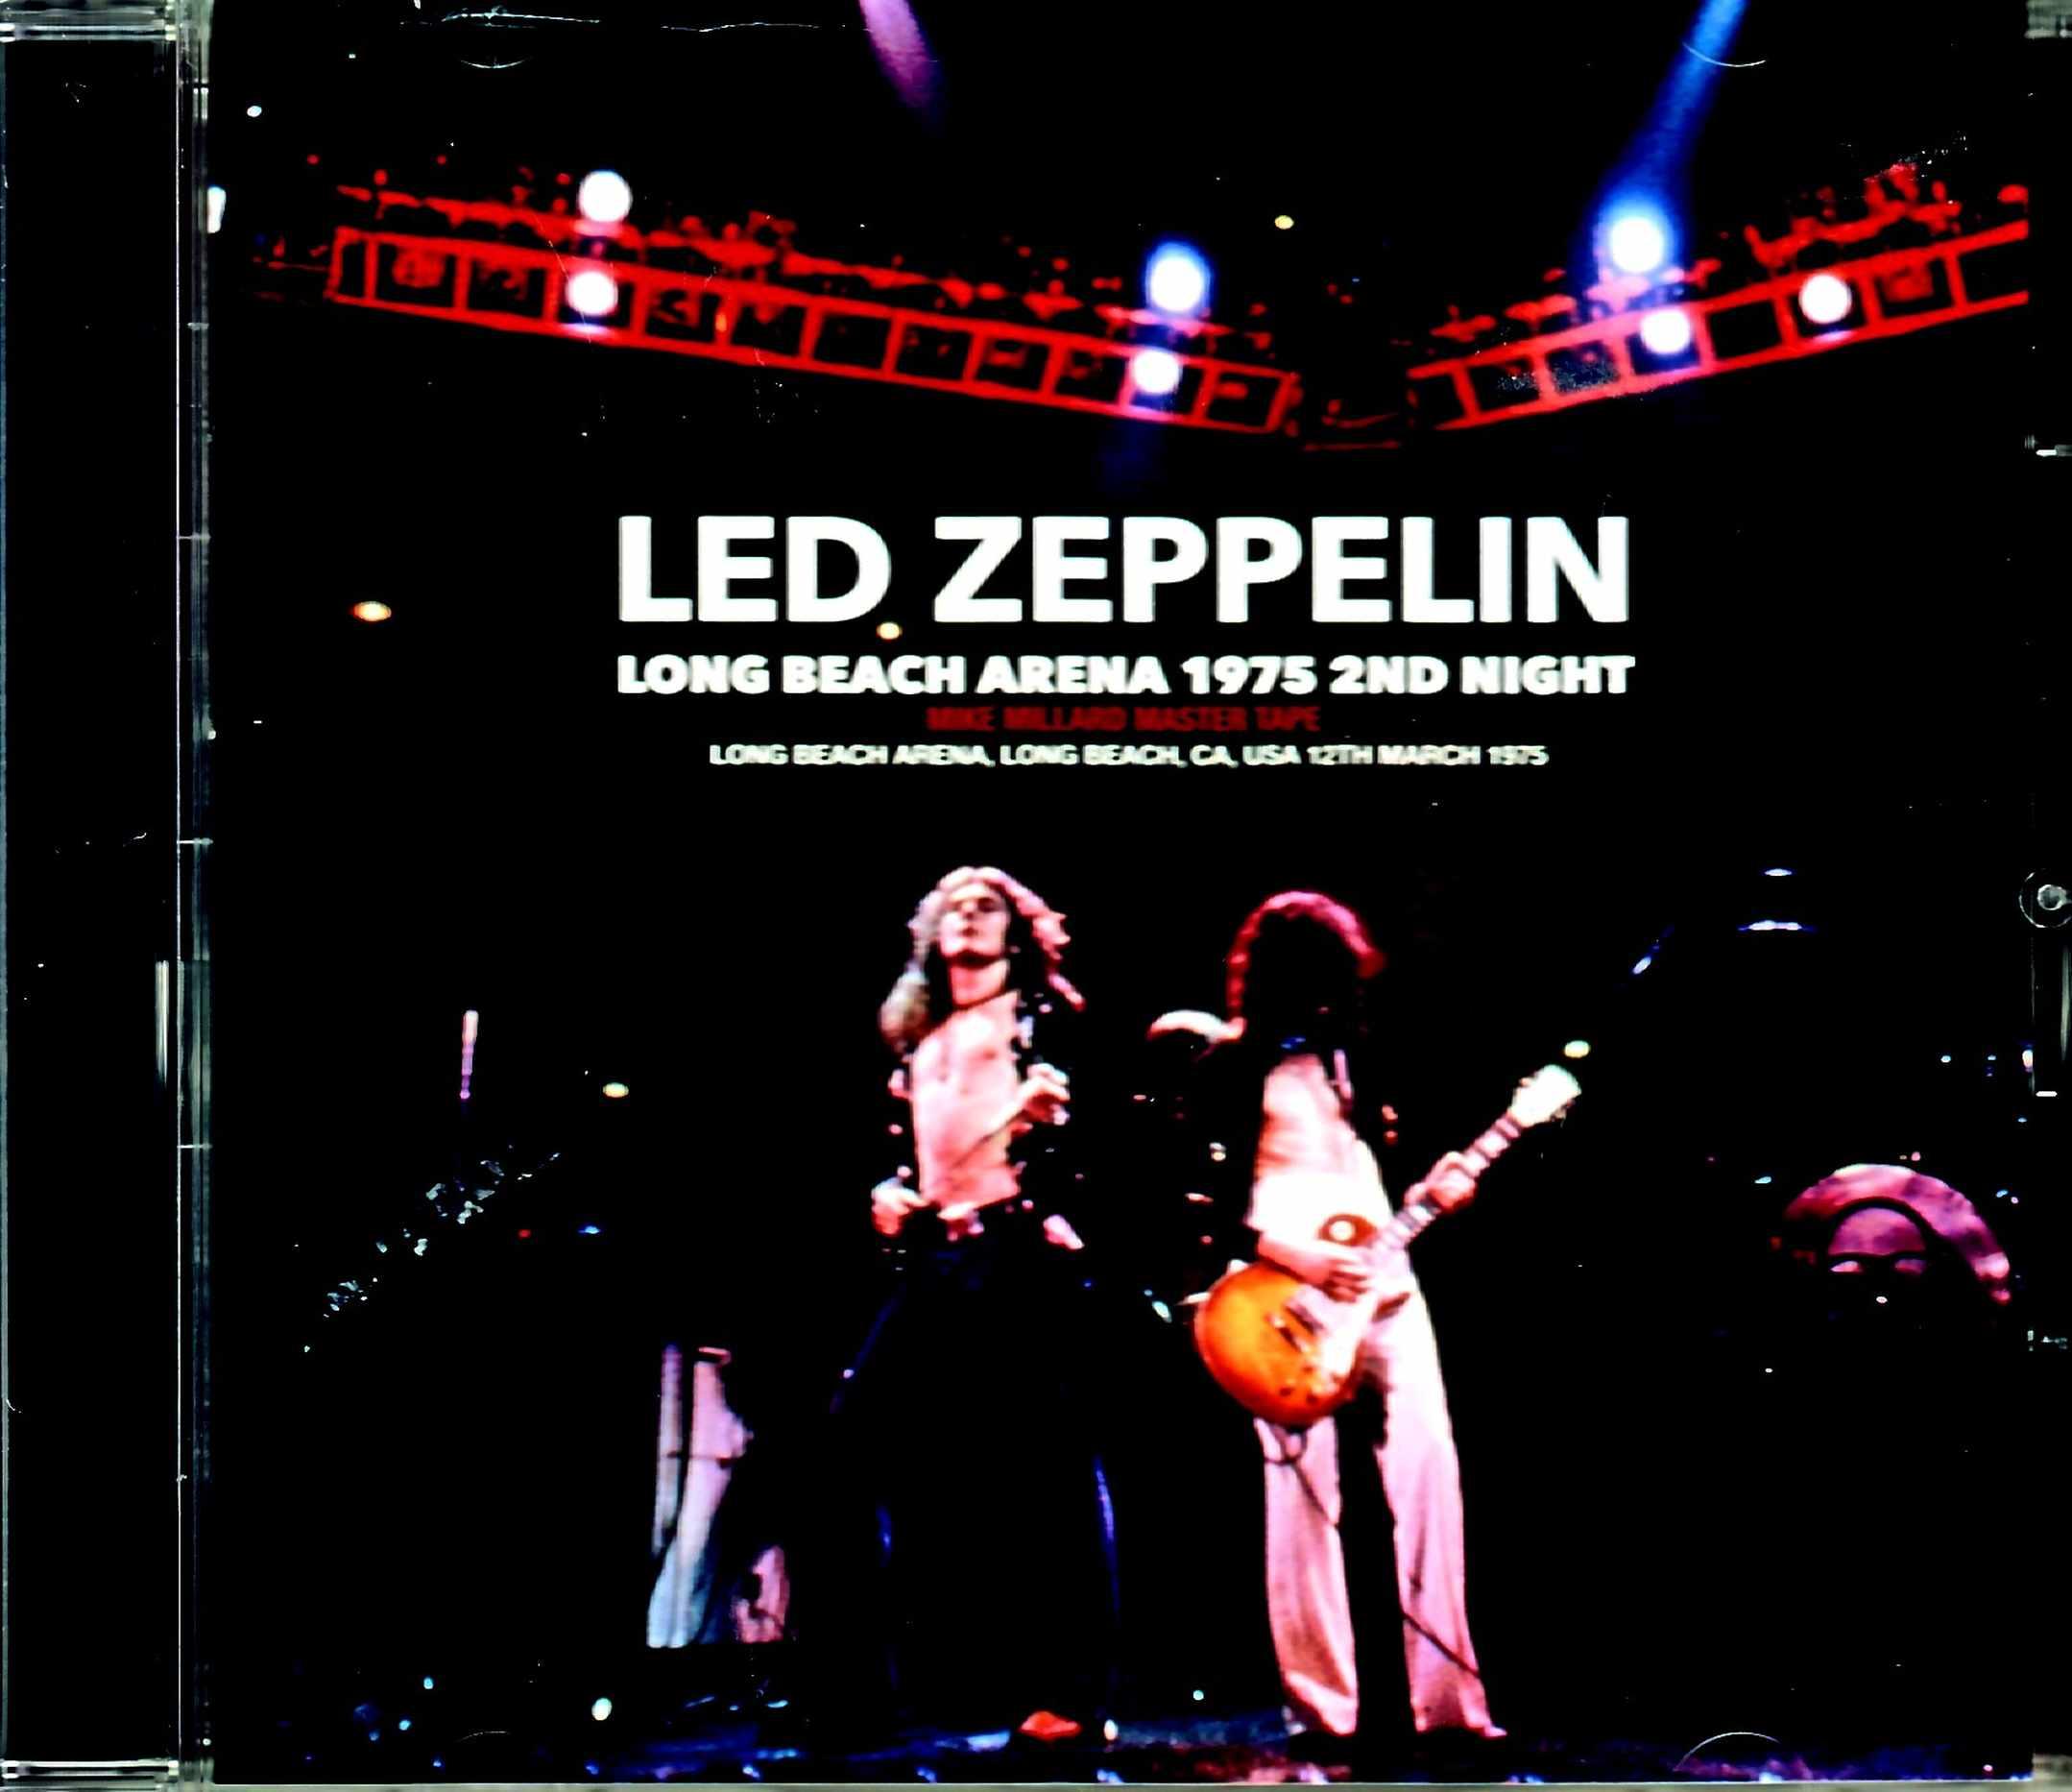 Led Zeppelin レッド・ツエッペリン/CA,USA 3.12.1975 Mike Millard Master Tapes